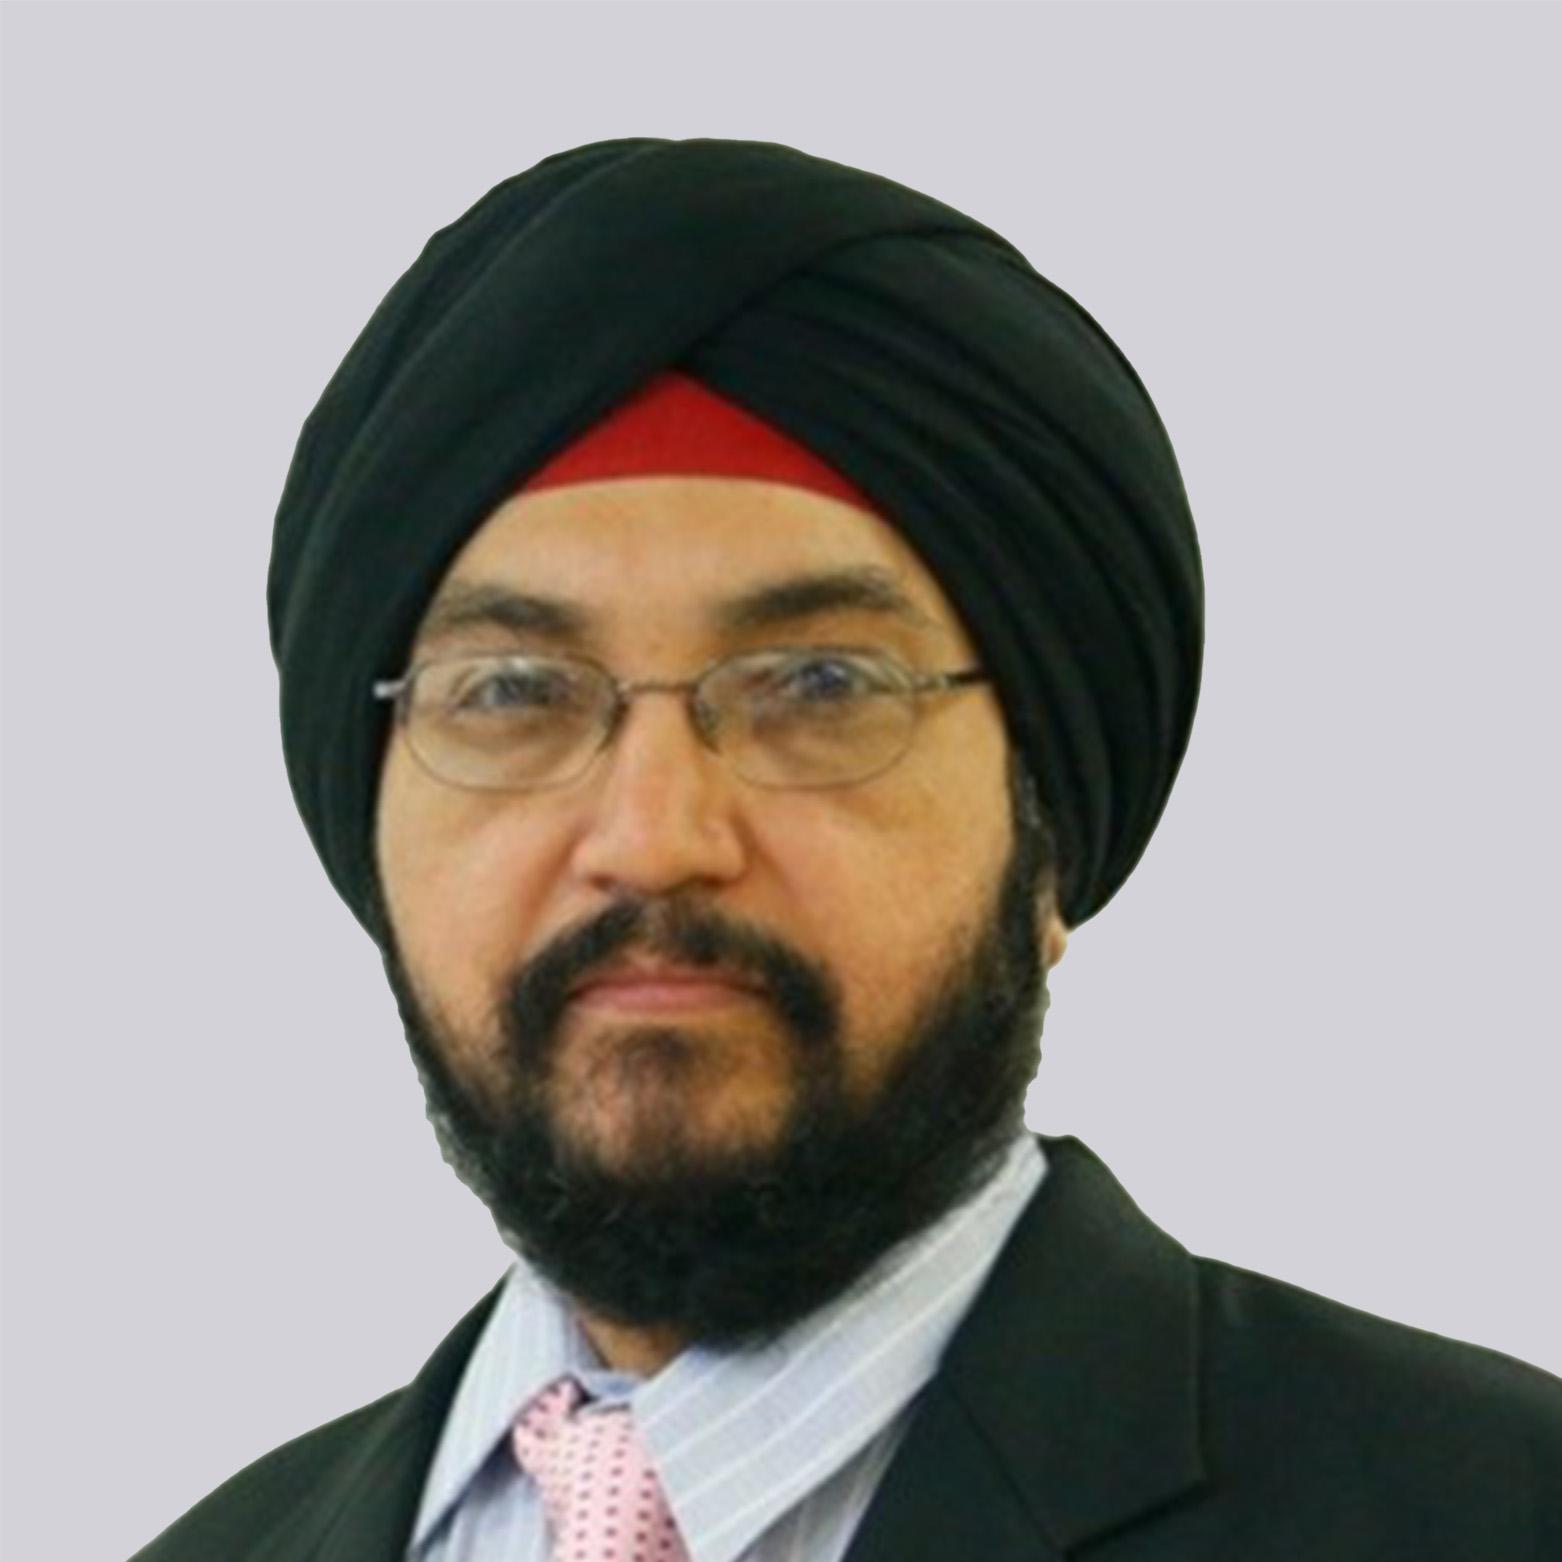 Kalwant Singh